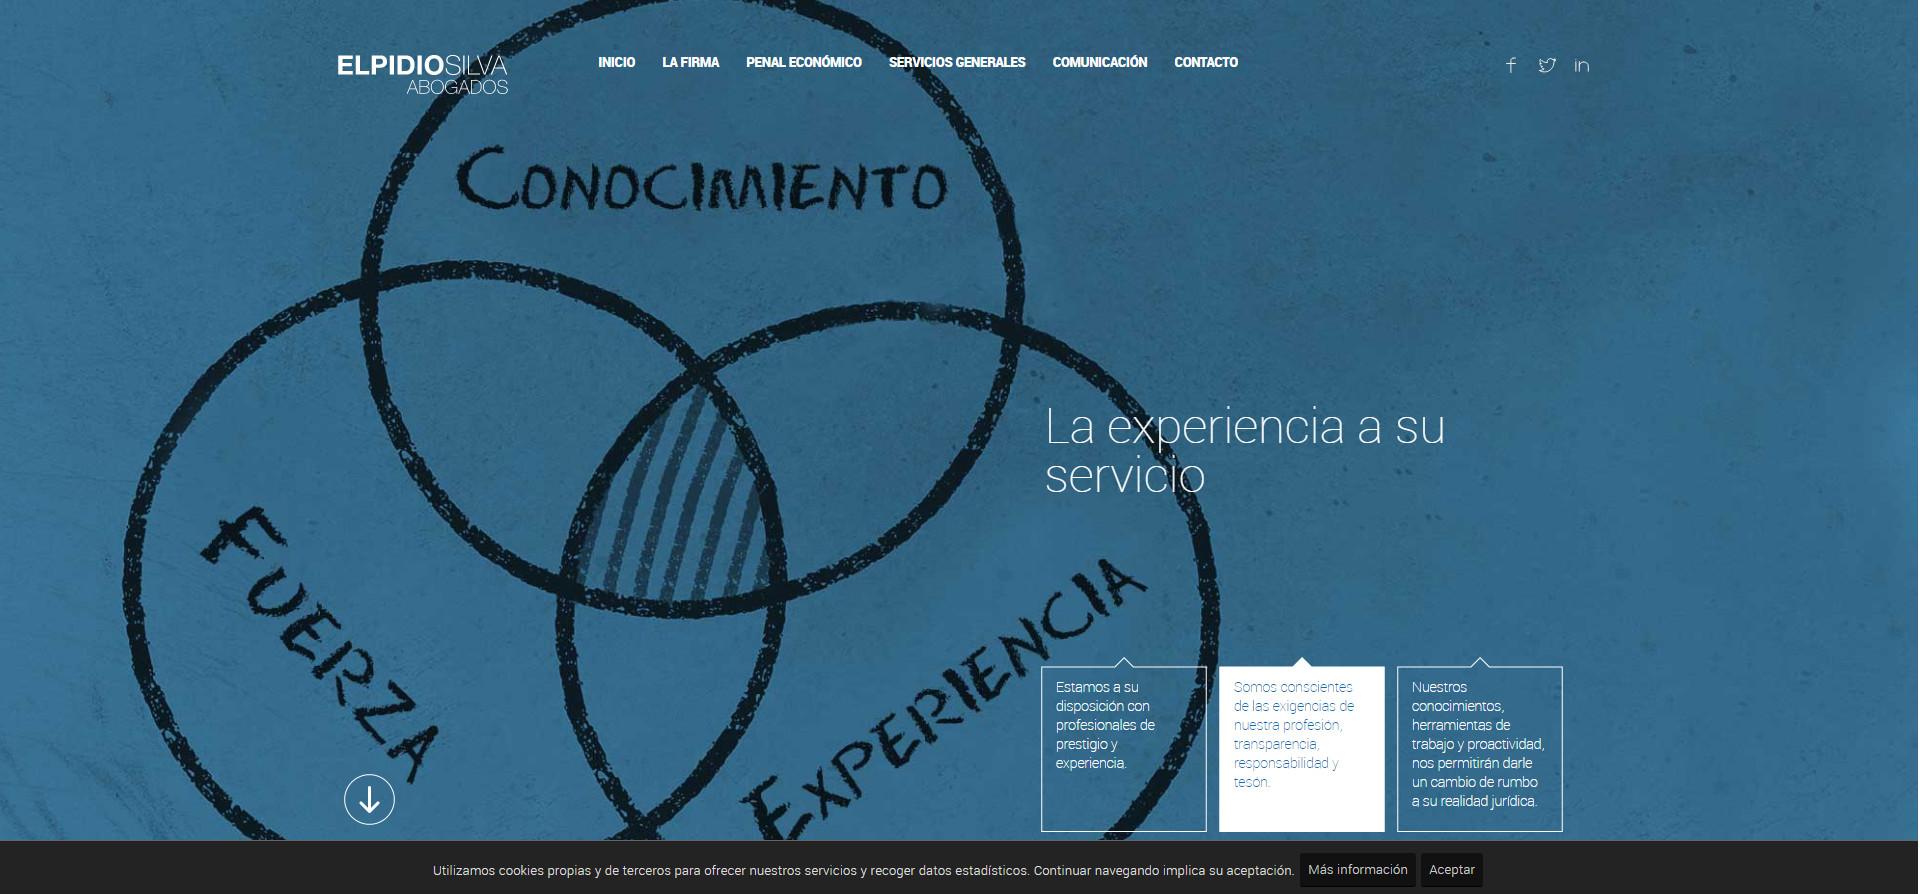 Imatge hero al web d'Elpidio Silva Abogados